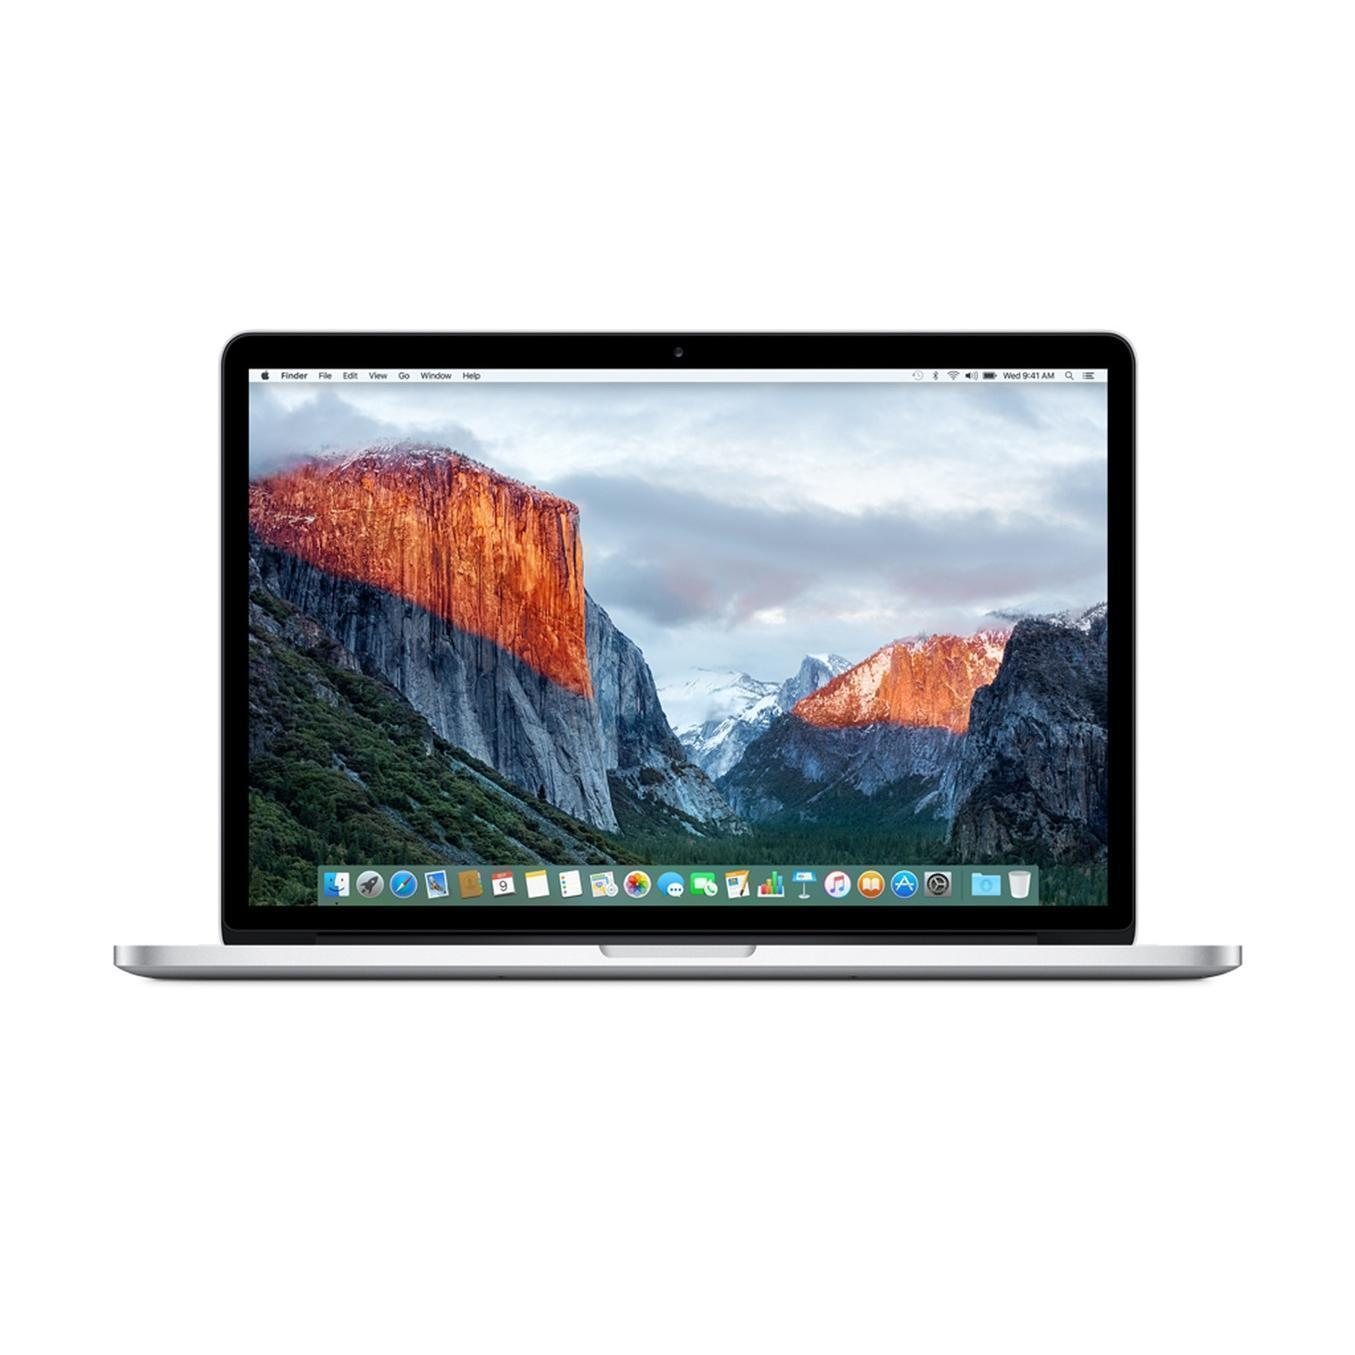 MacBook Pro Retina 15.4-inch (2015) - Core i7 - 16GB - SSD 500 GB QWERTY